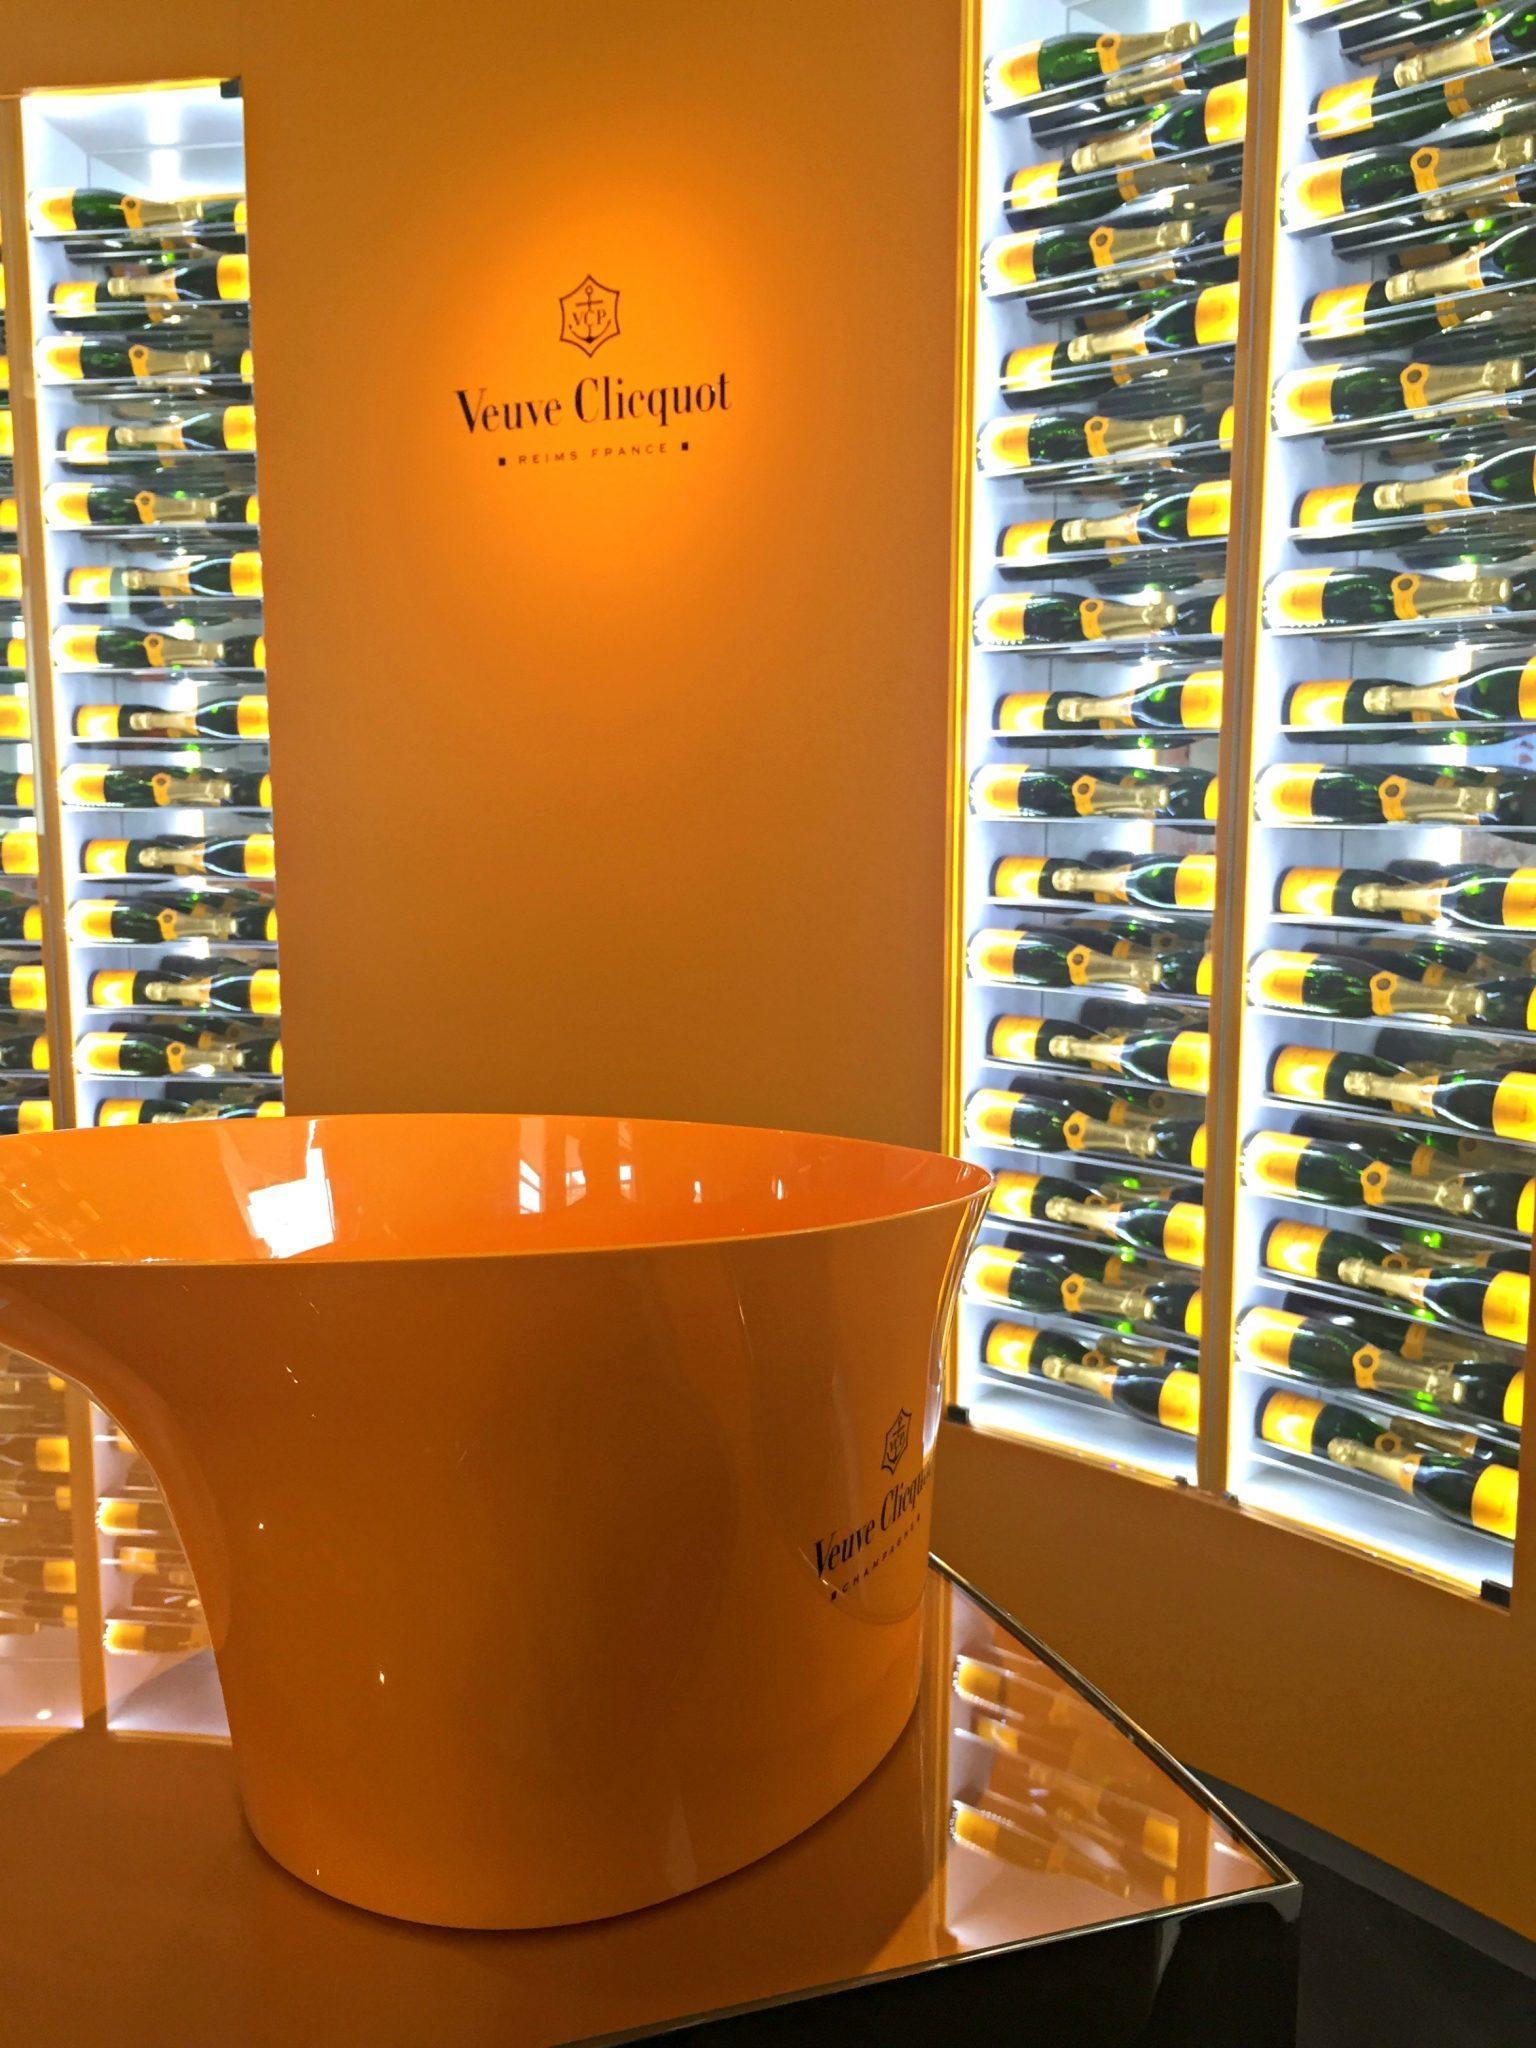 paris day trip touring champagne region in reims